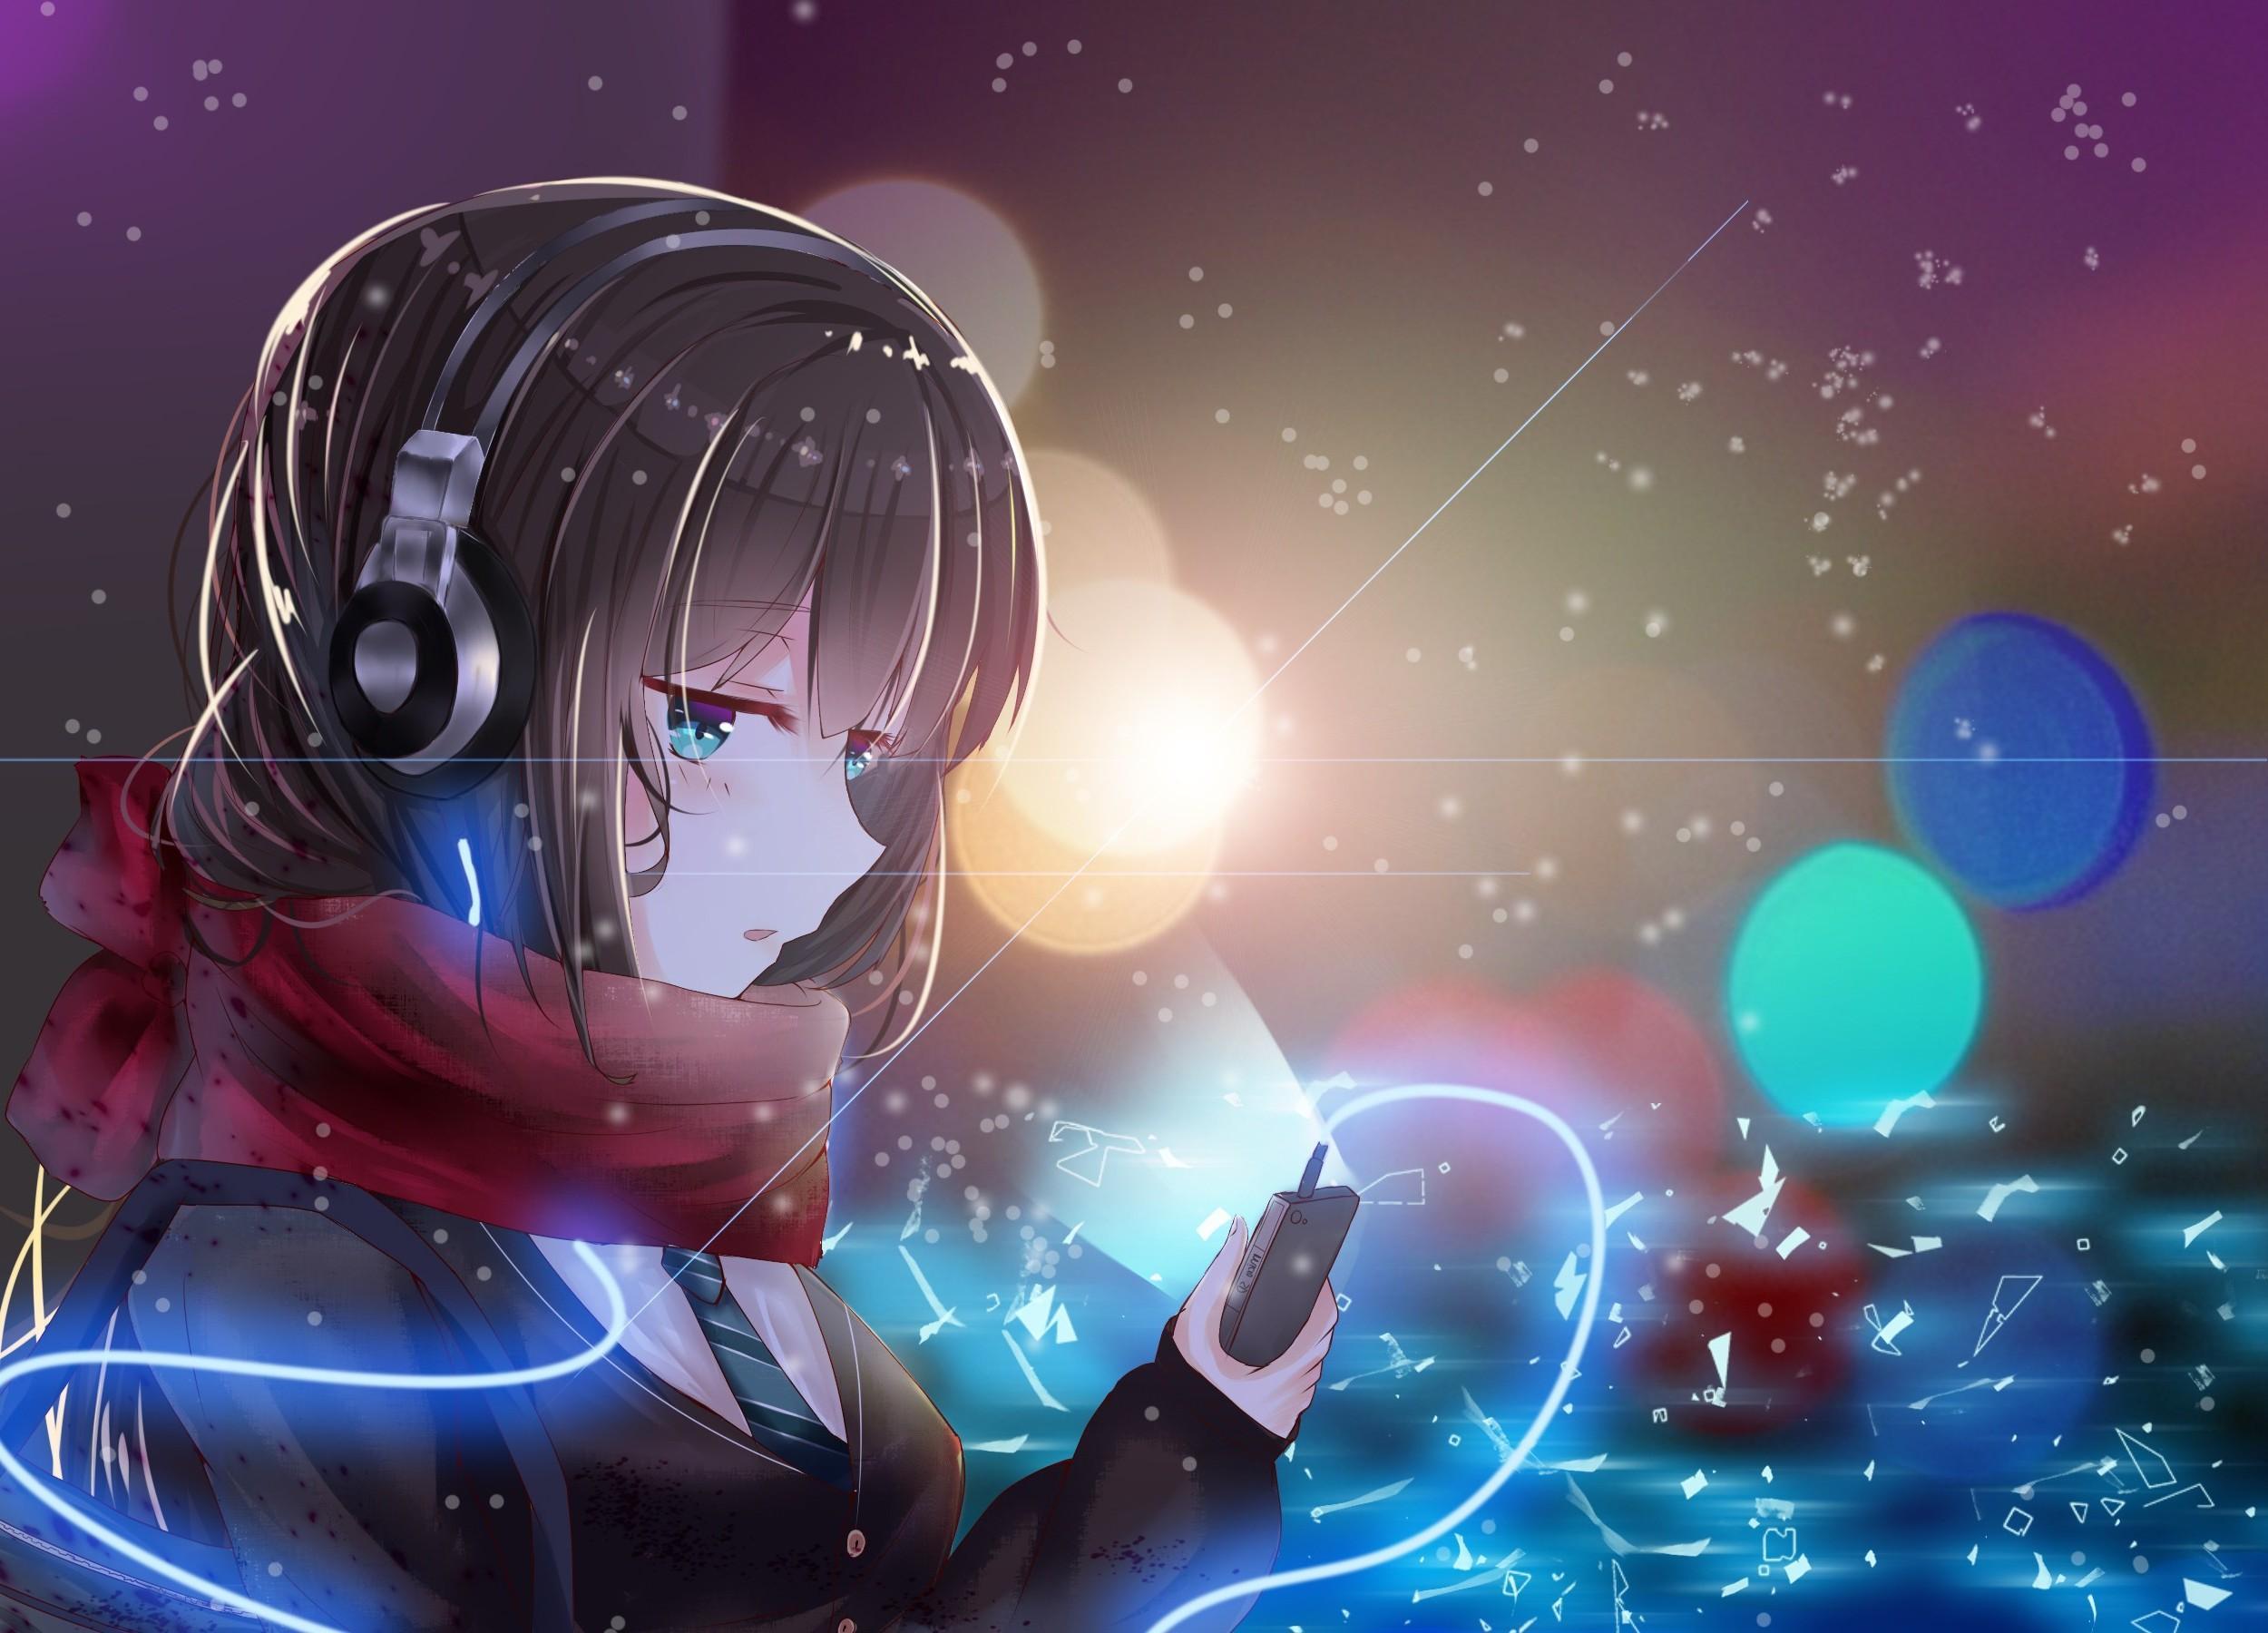 Anime Girl Headphone Wallpapers - Wallpaper Cave